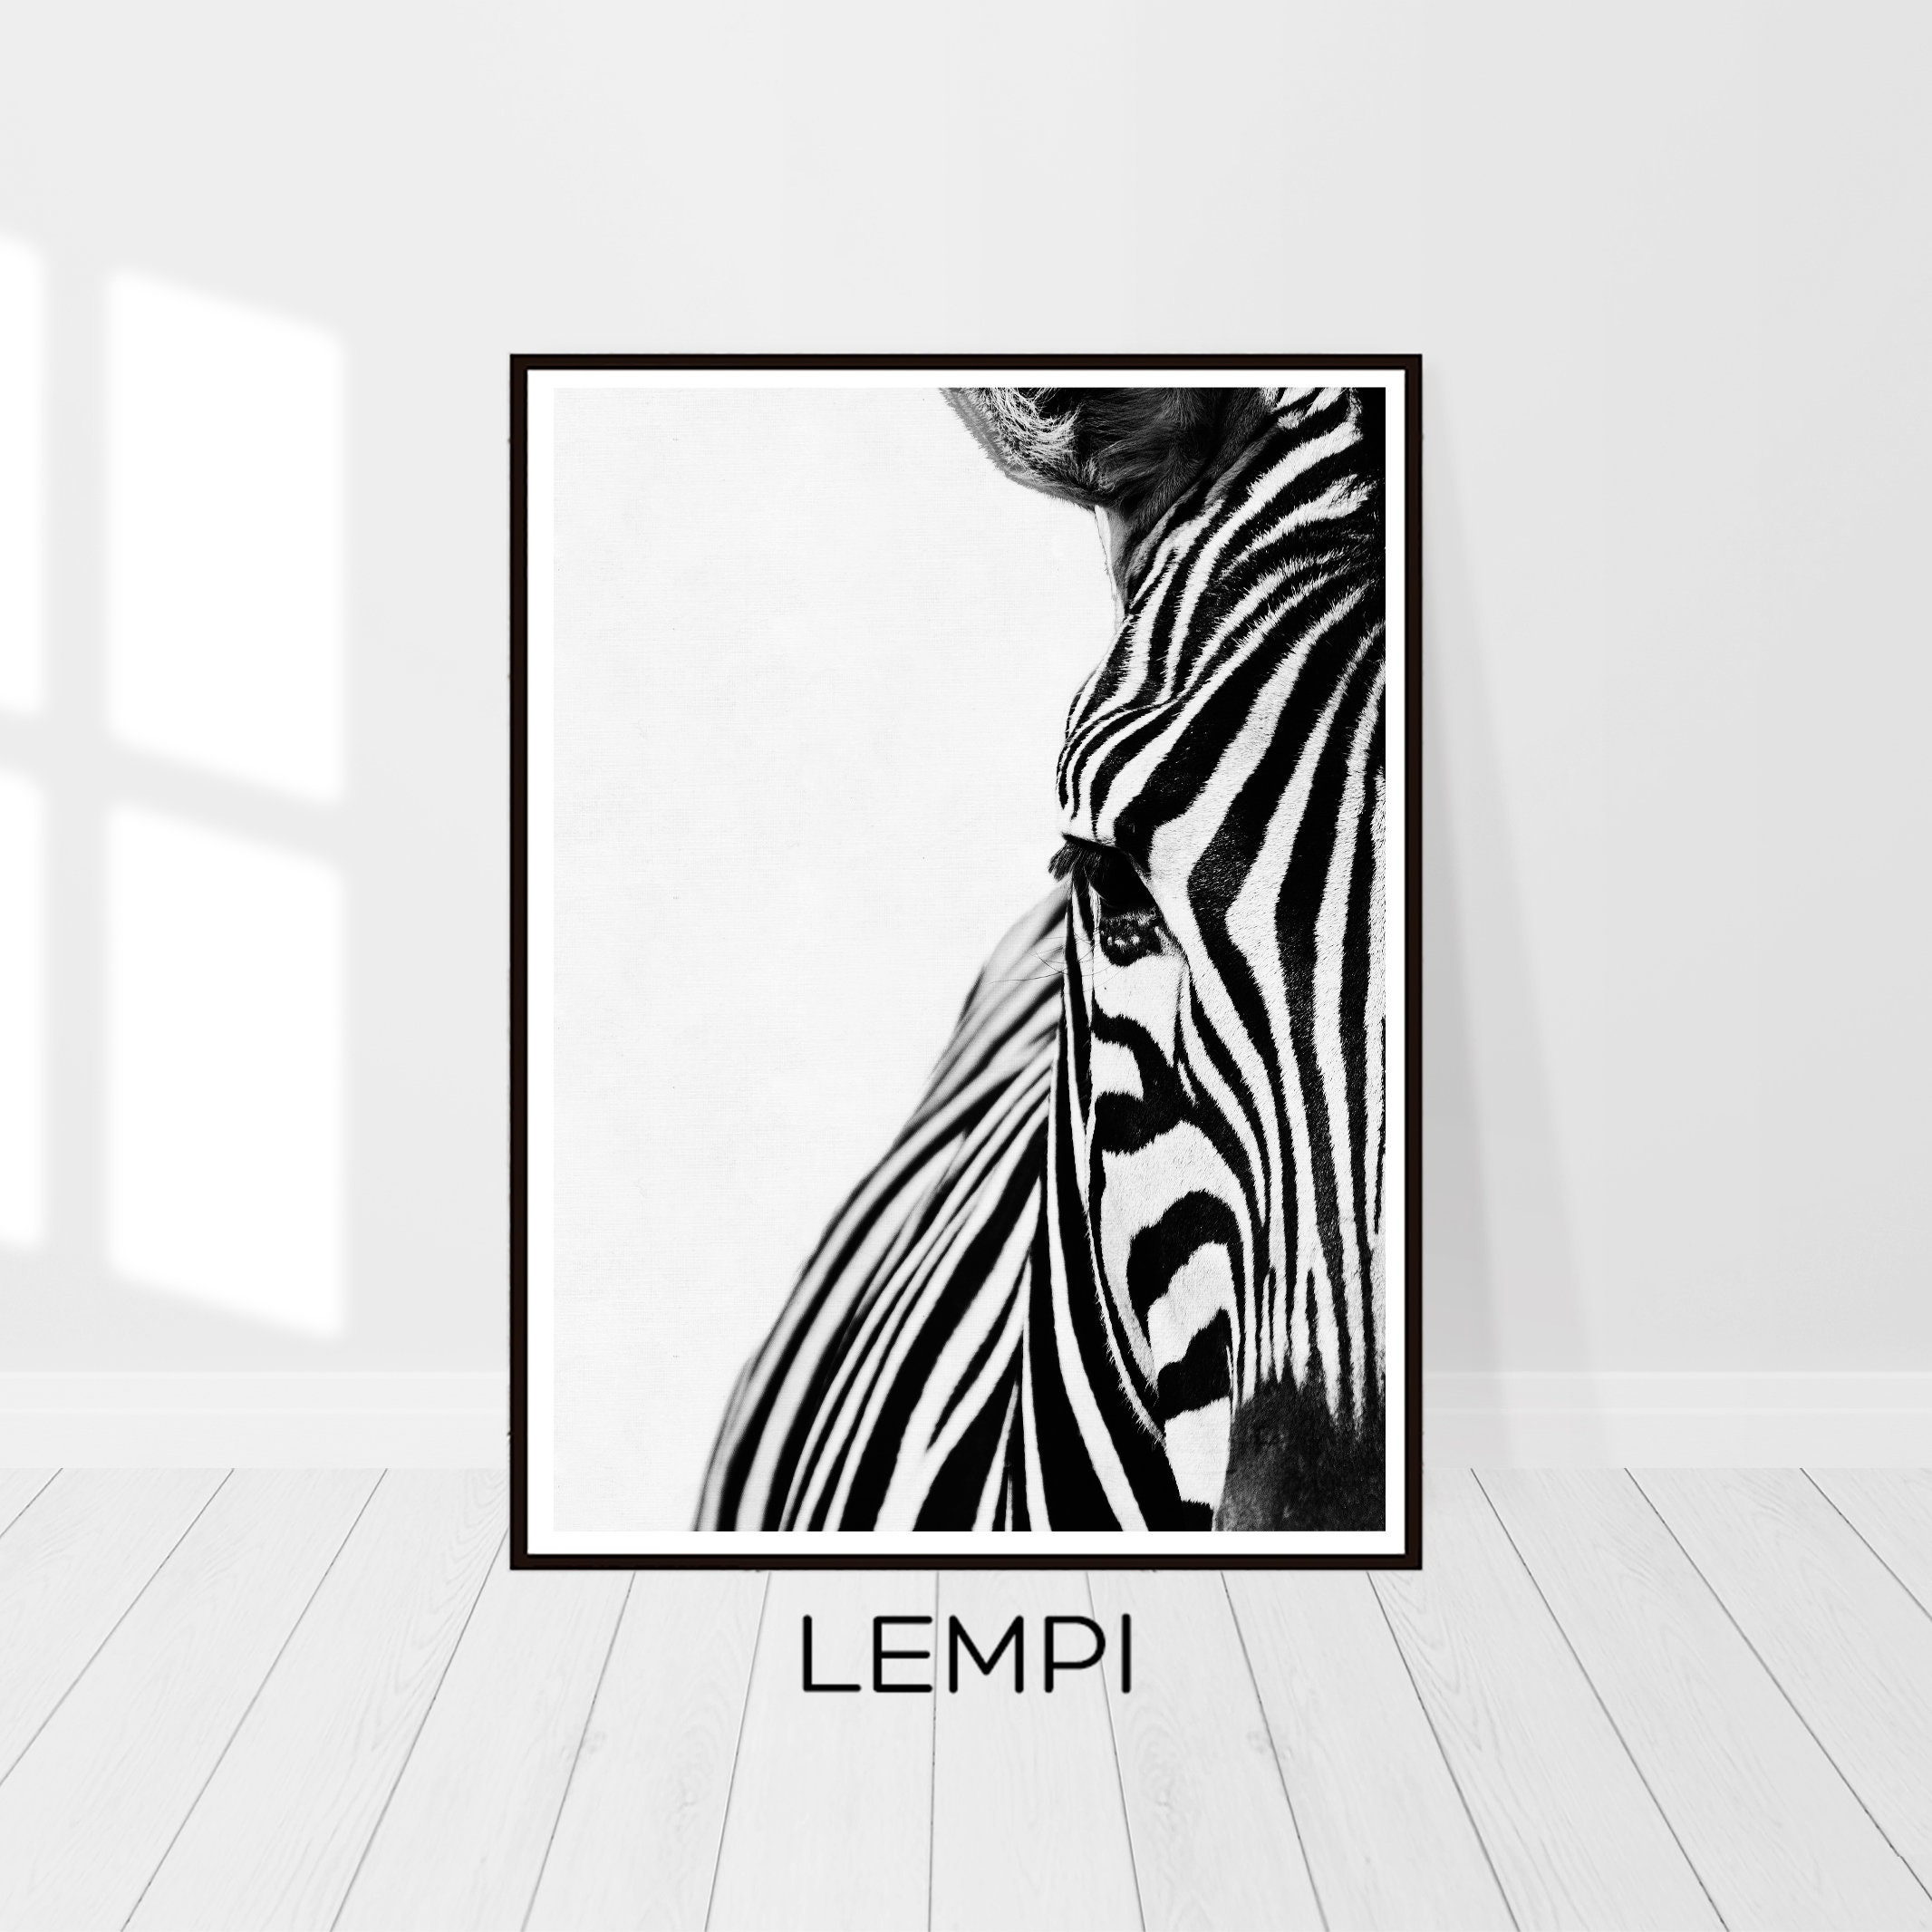 Großzügig Zebra Einladungsvorlage Bilder - Entry Level Resume ...